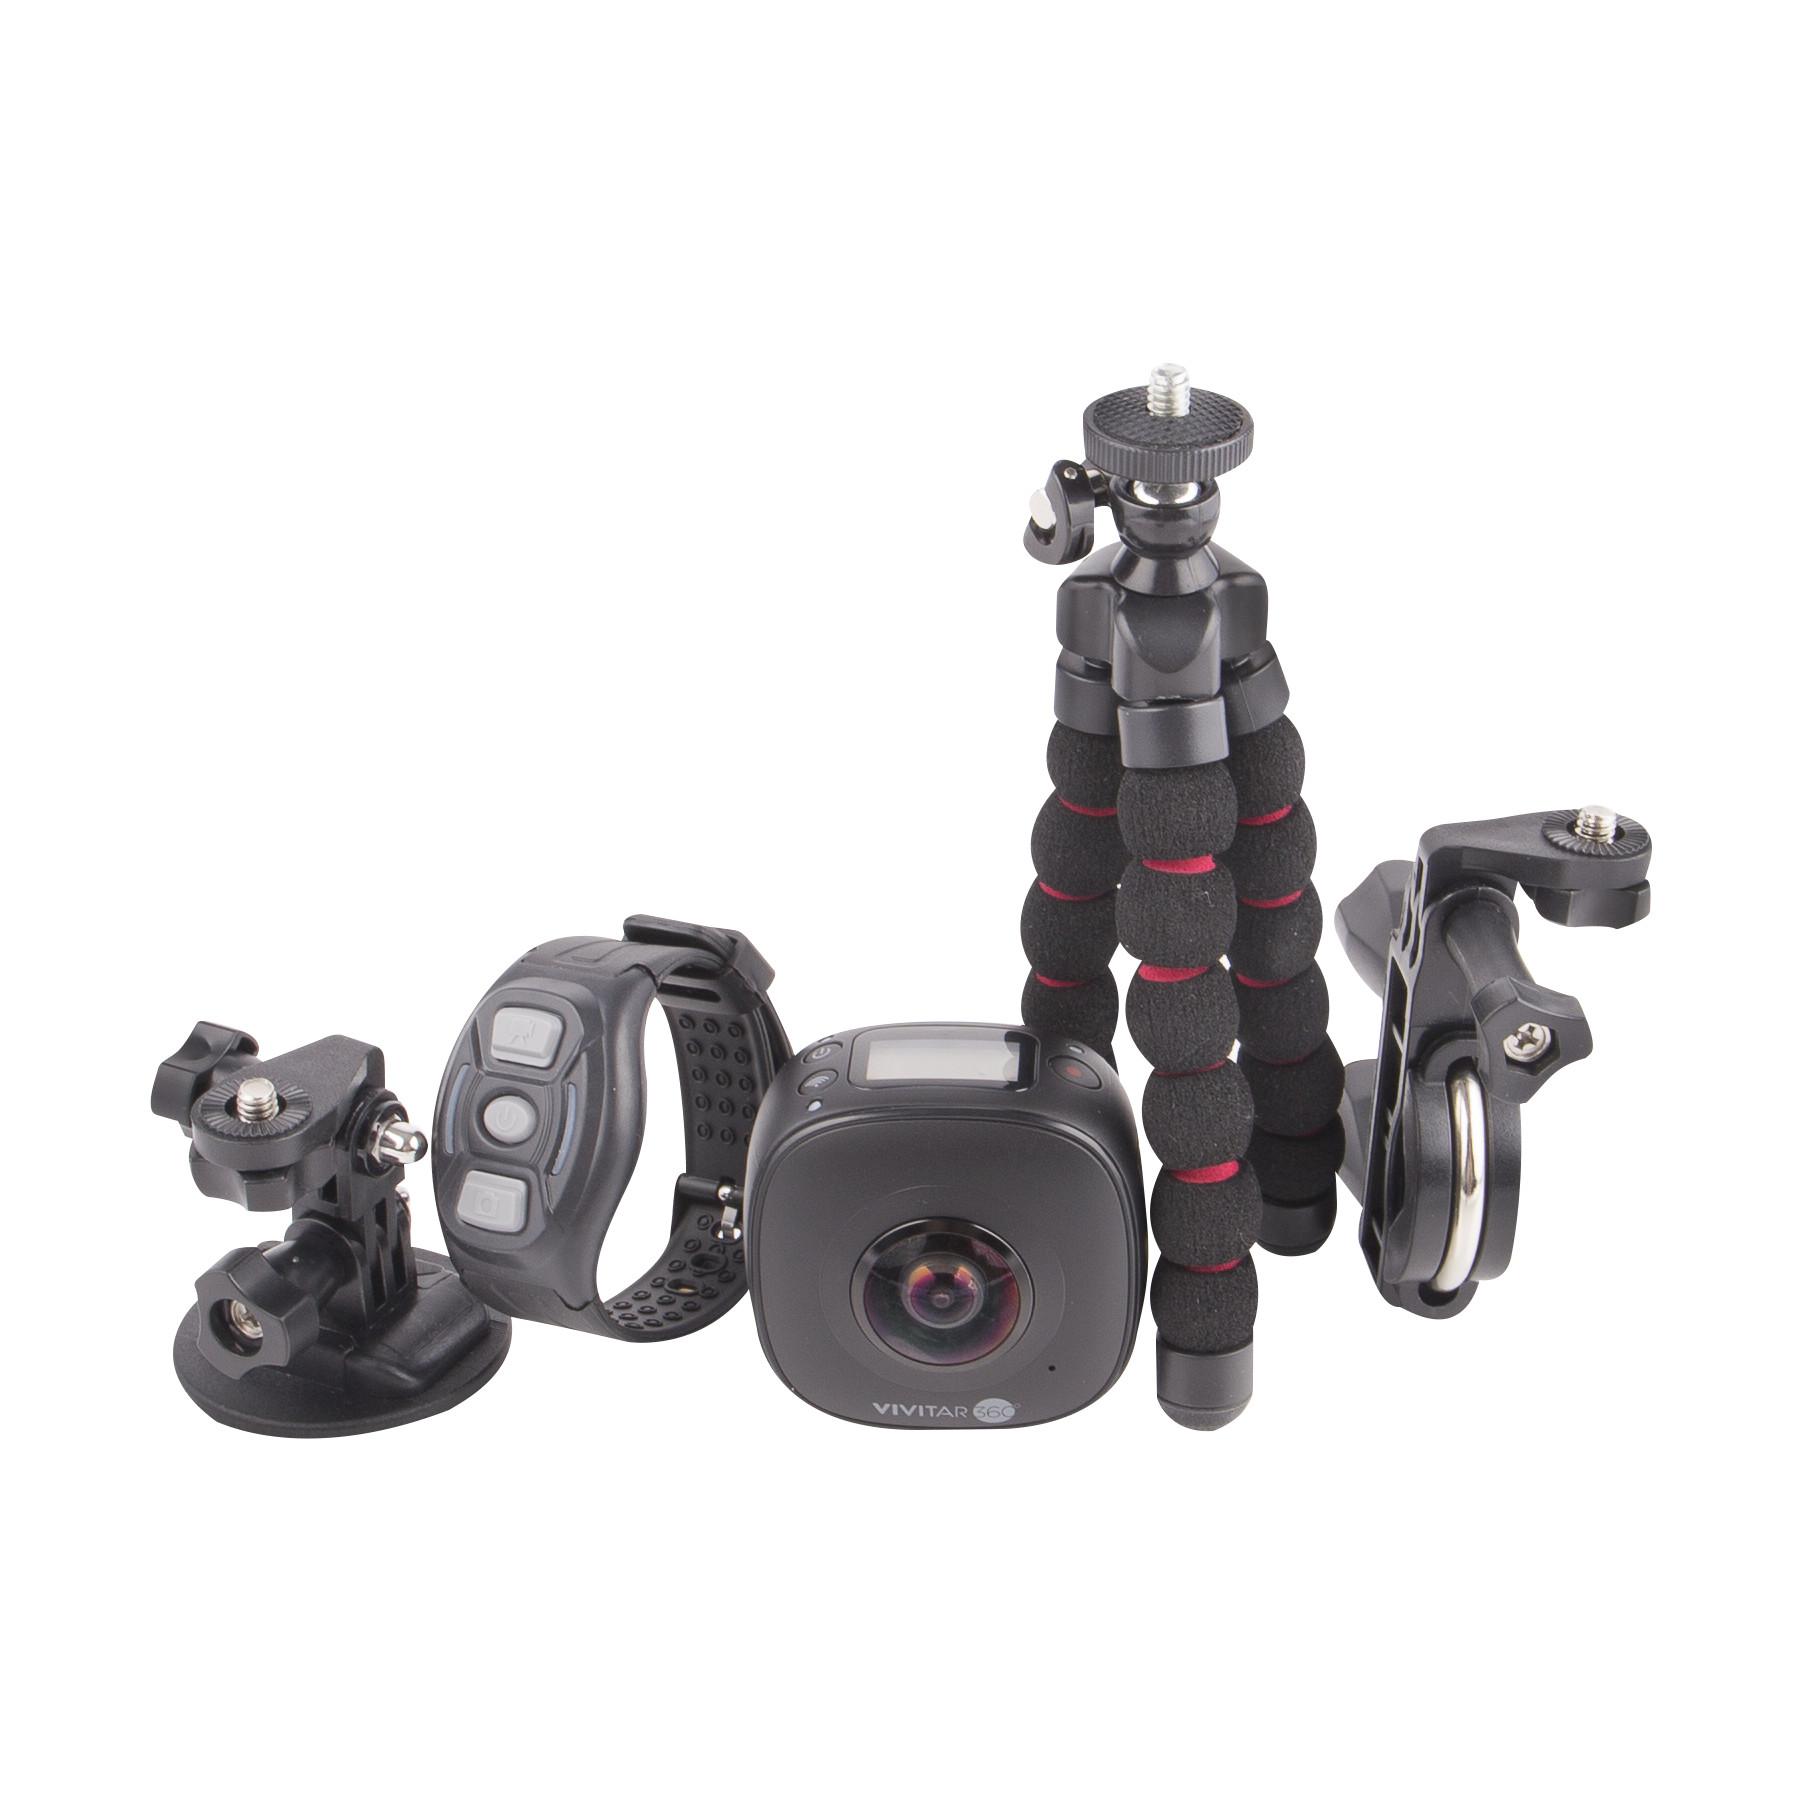 Vivitar 360 Action Camera $17.00 YMMV Clearance @ Walmart B&M